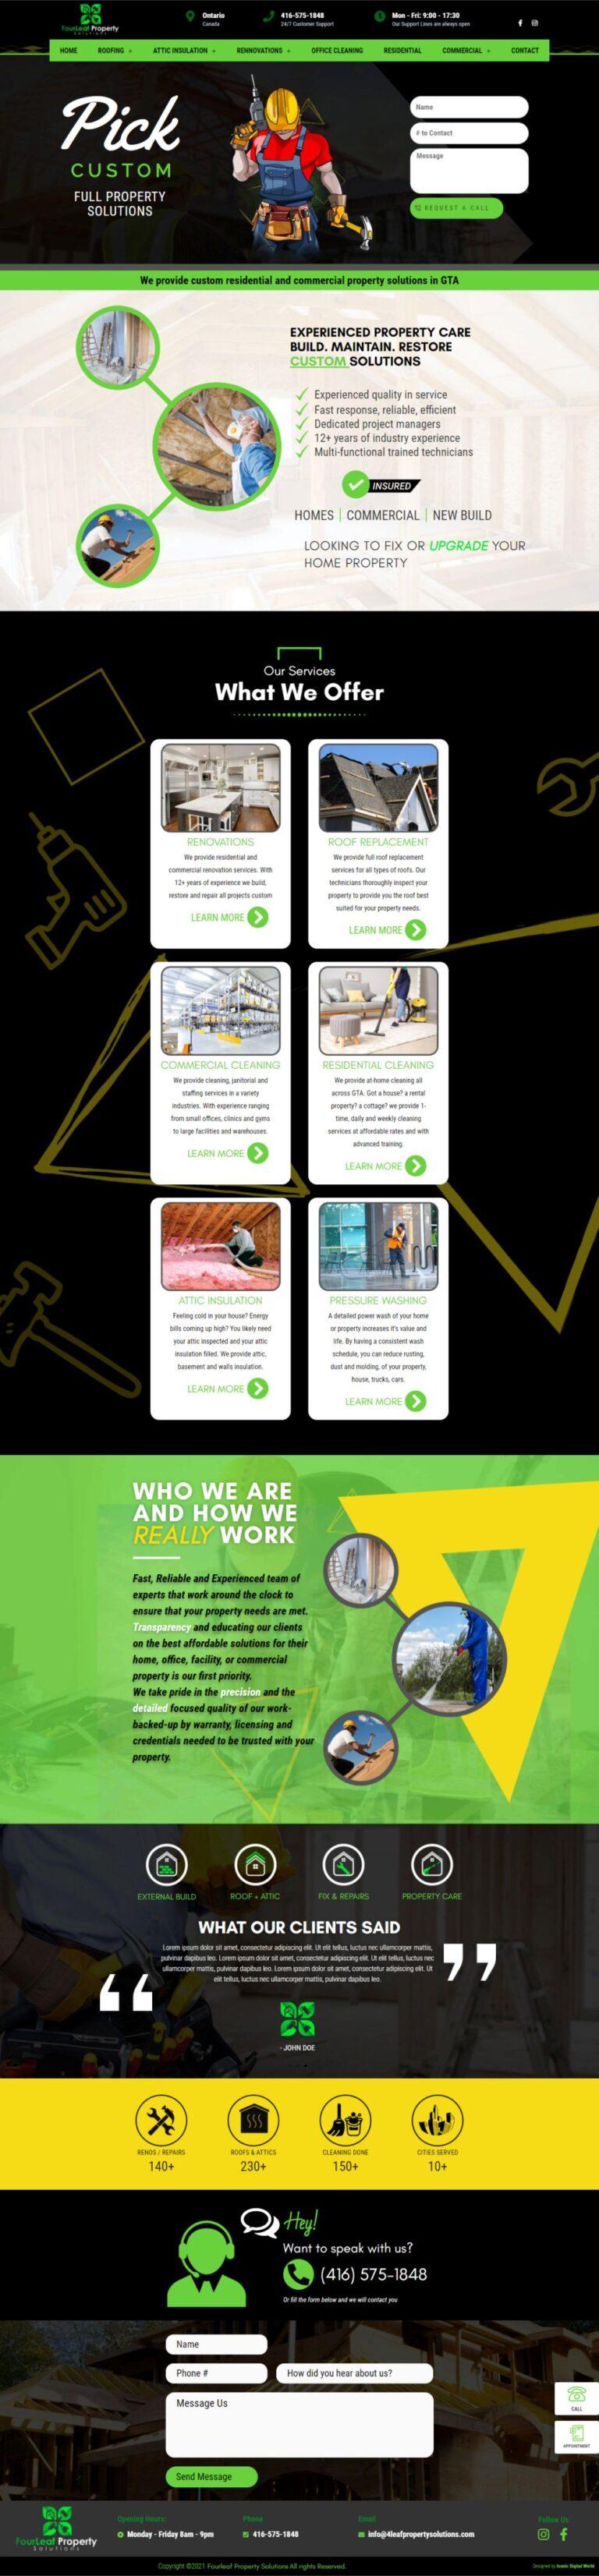 4leafpropertysolutions Homepage - 4leafpropertysolutions website design